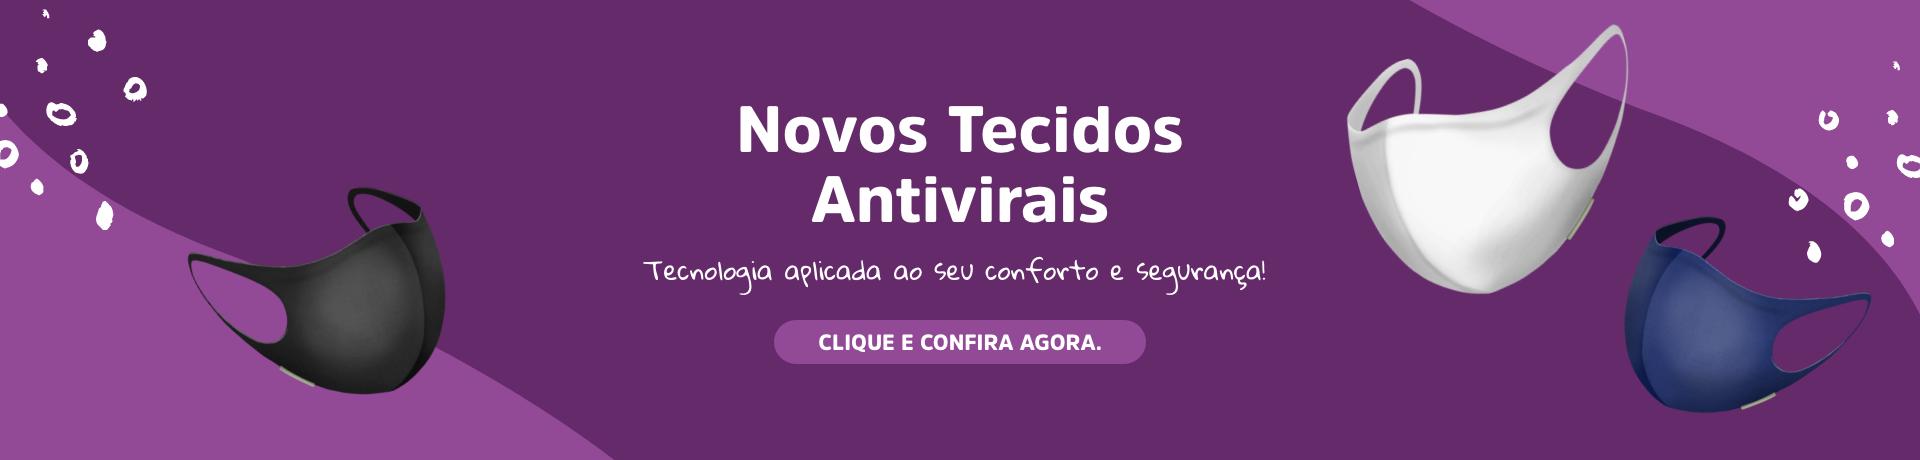 tricoline antiviral